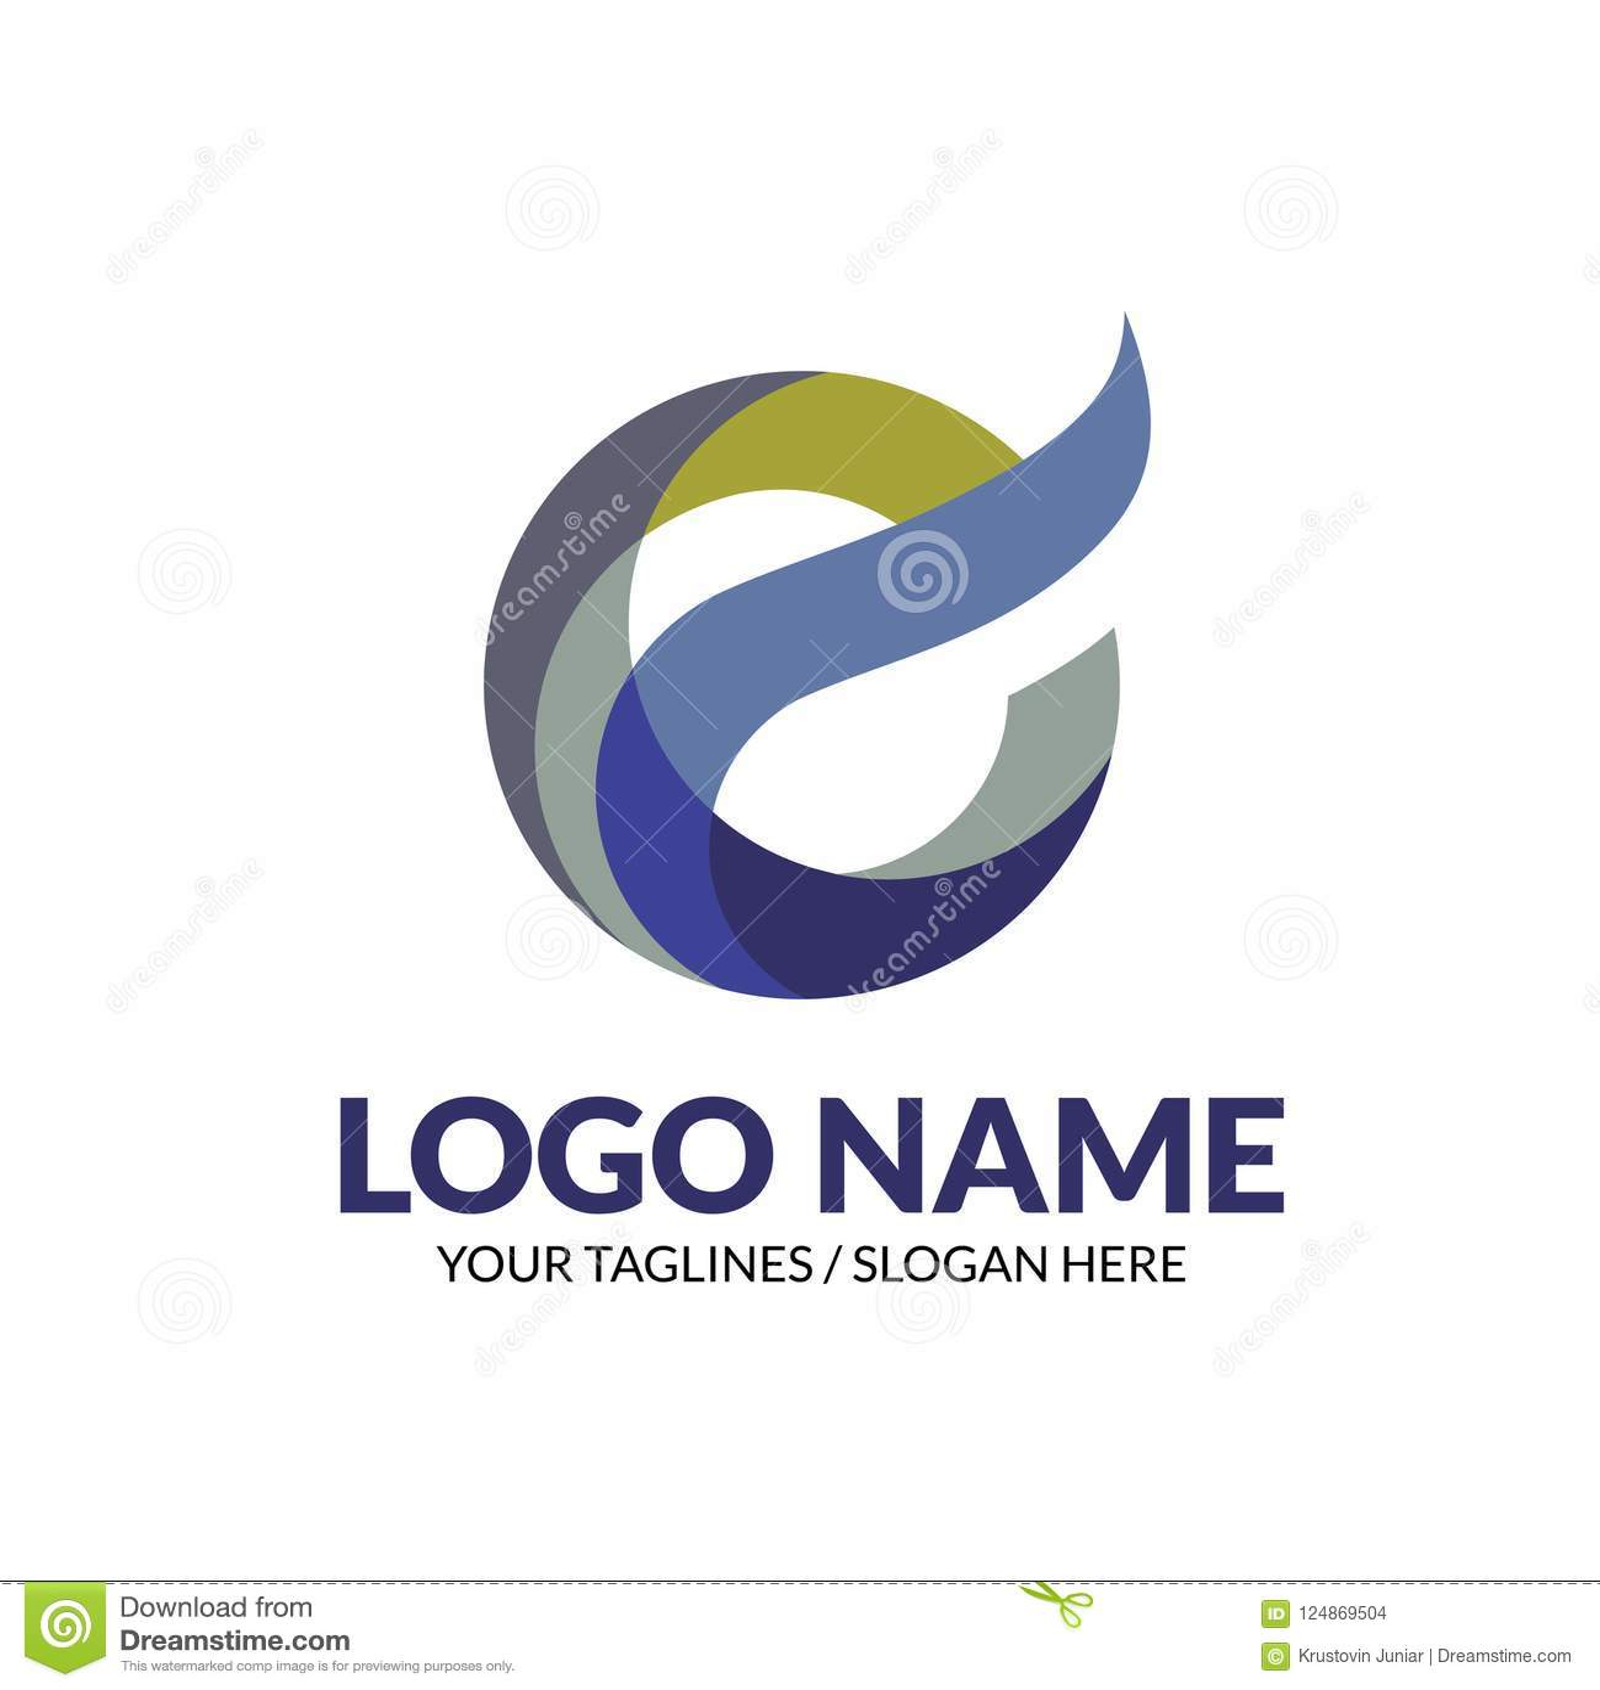 Conceito elegante moderno criativo do logotipo da letra E